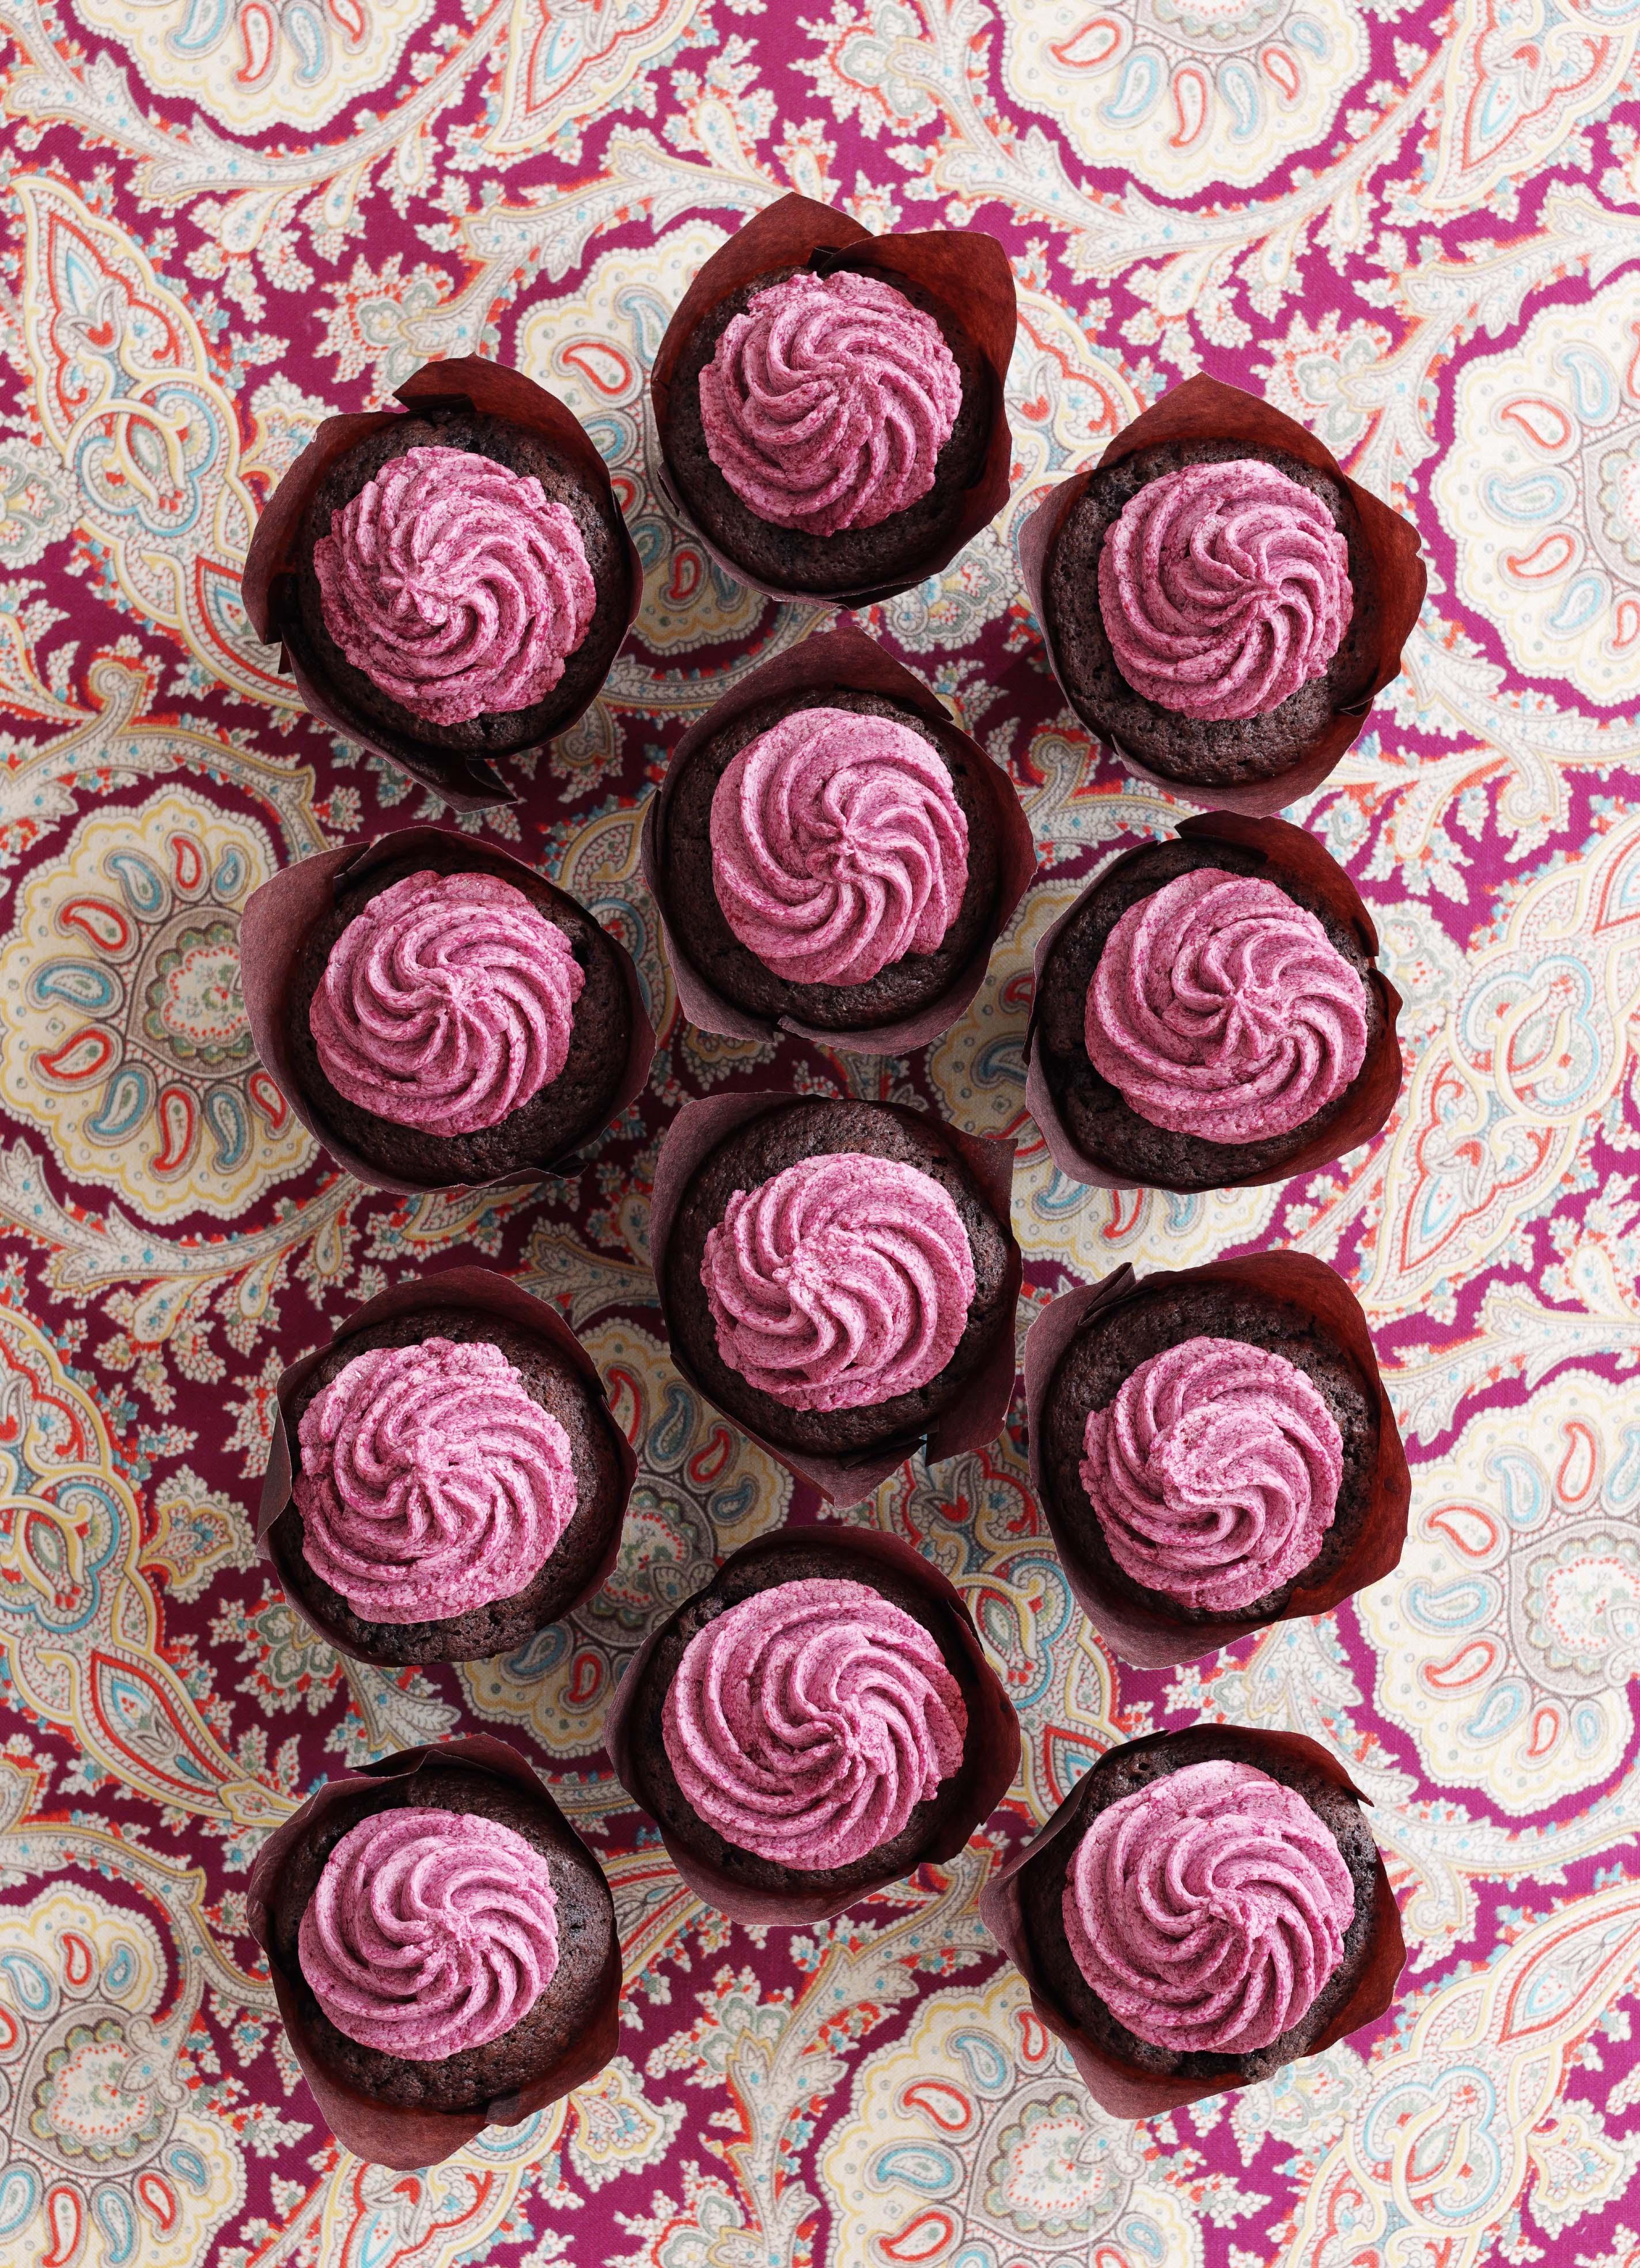 Blackberry Chocolate Cupcakes with Blackberry Buttercream